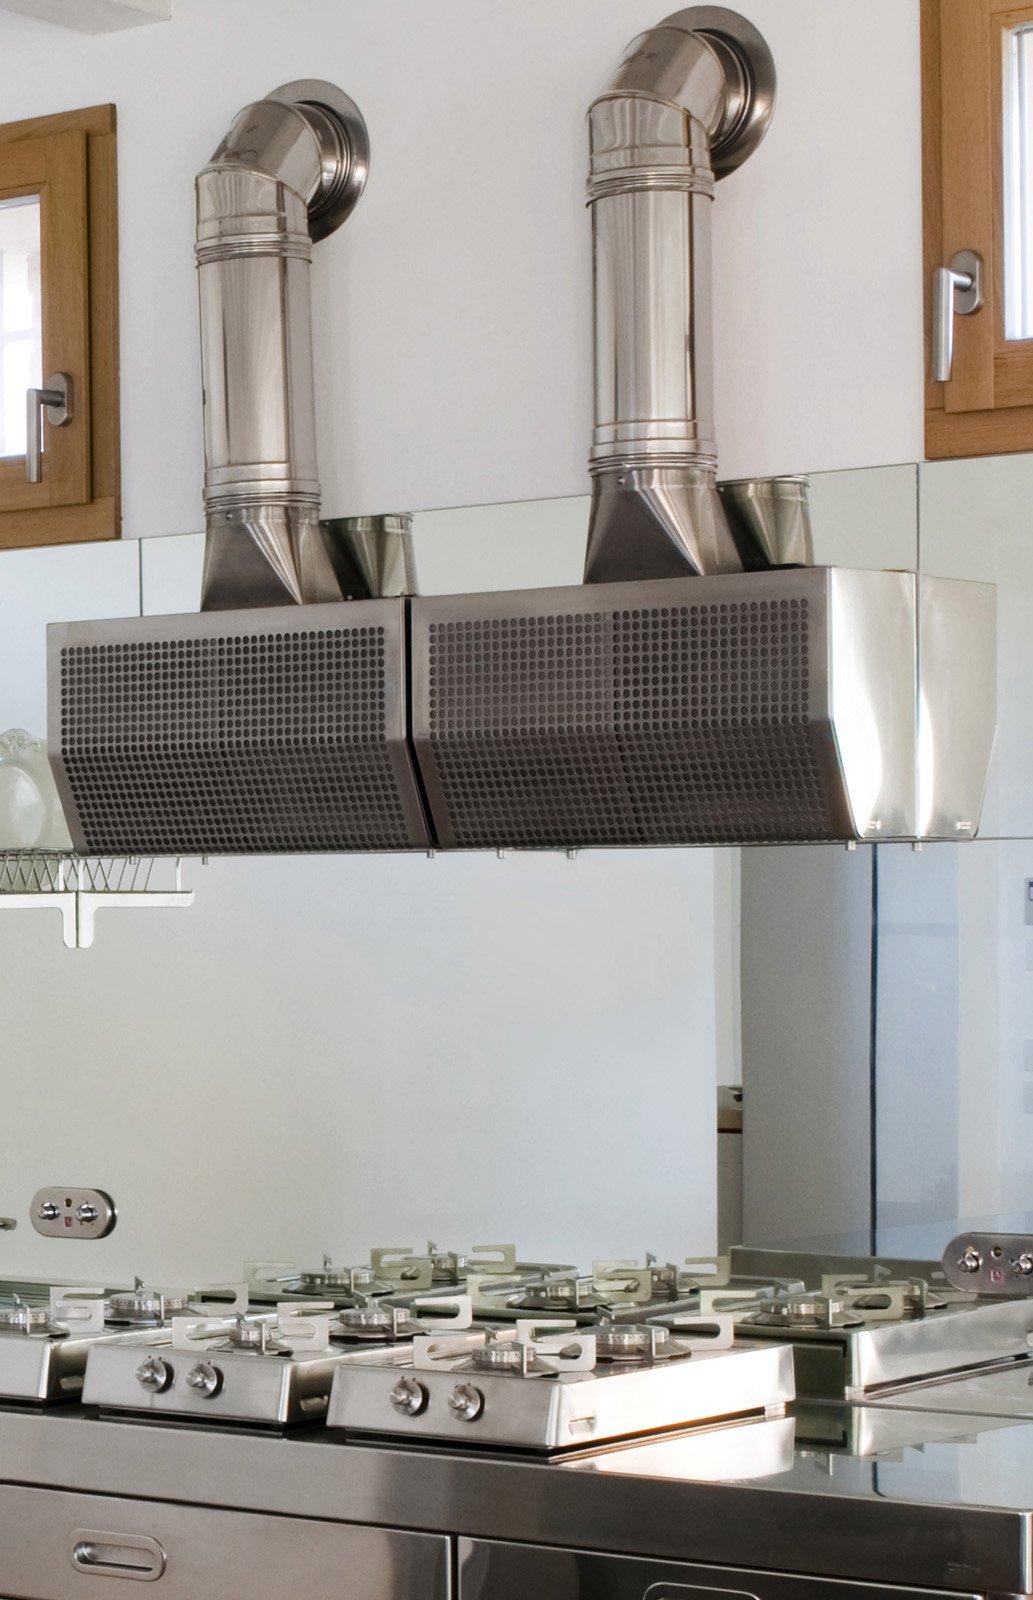 Cappe per la cucina - Cose di Casa